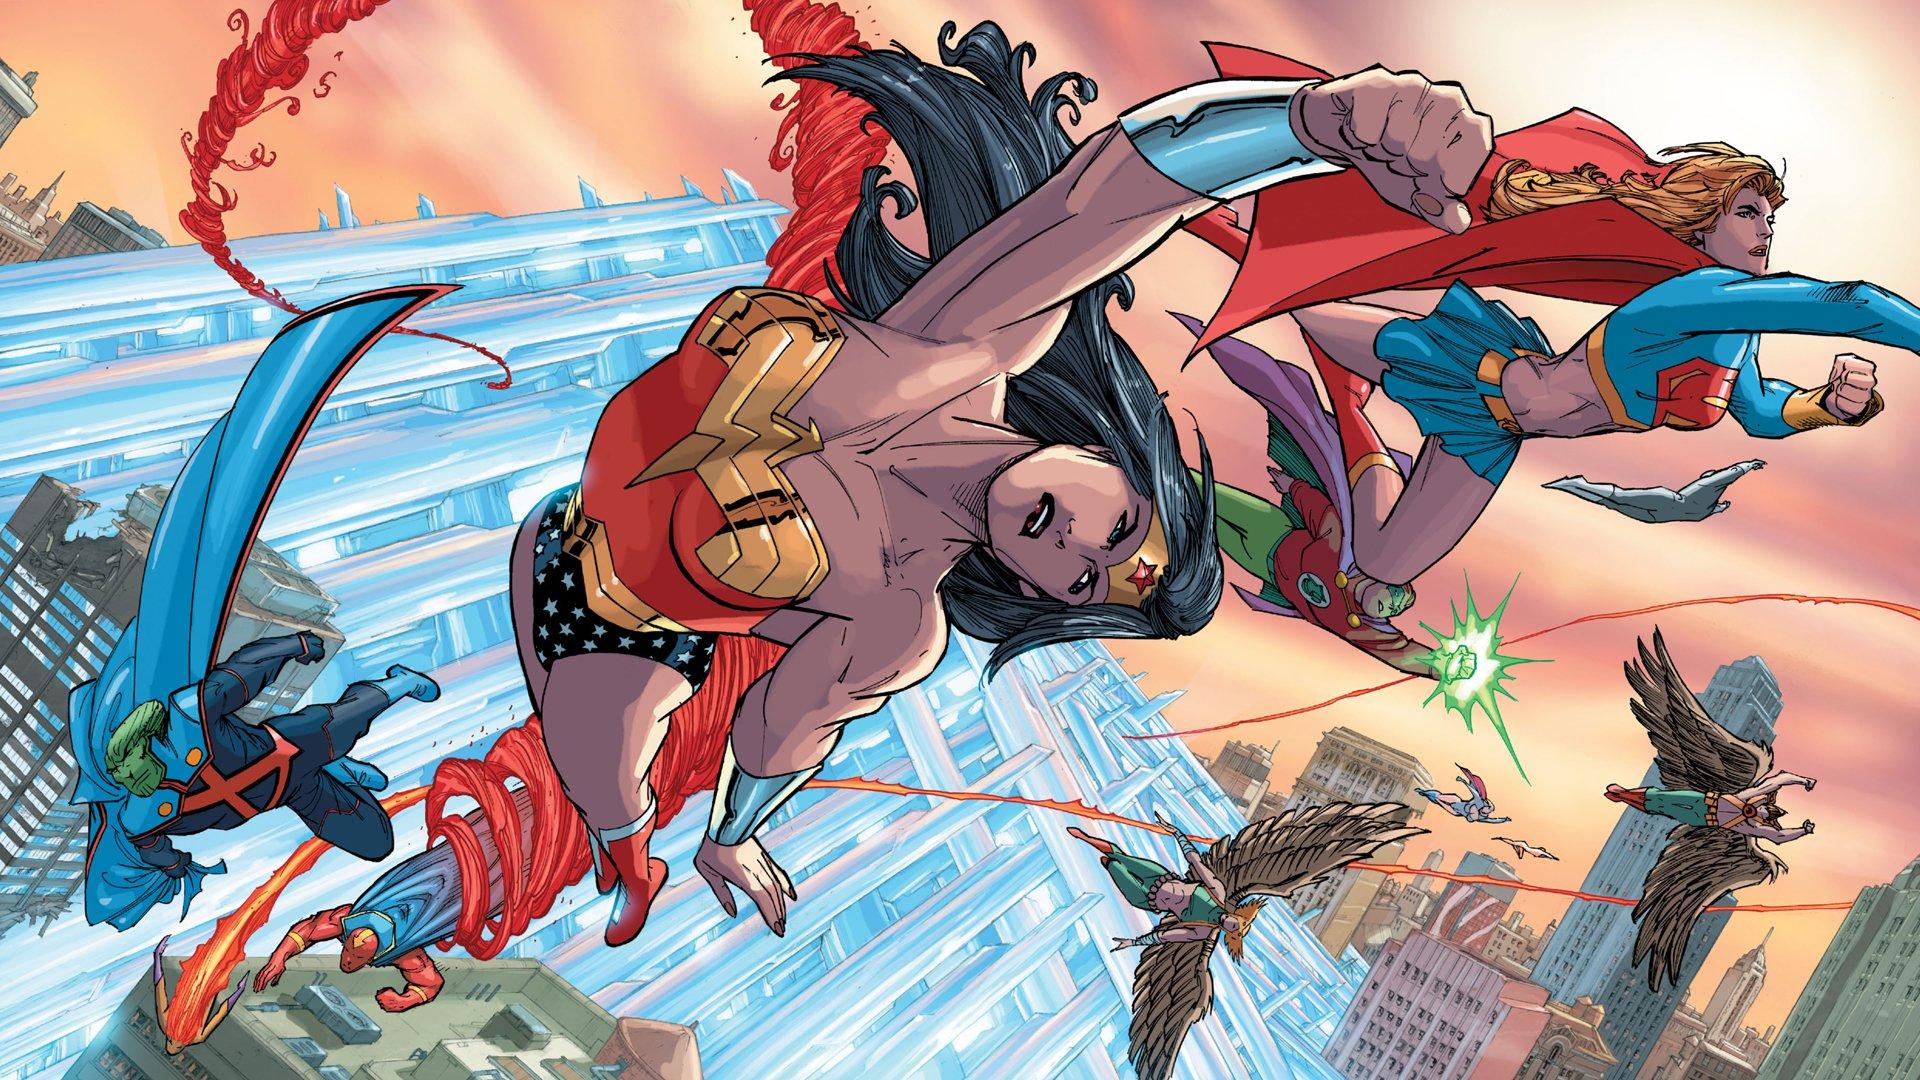 Comics - Justice League Of America  Martian Manhunter Wonder Woman Hawkgirl Green Lantern Supergirl Hawkman Wallpaper